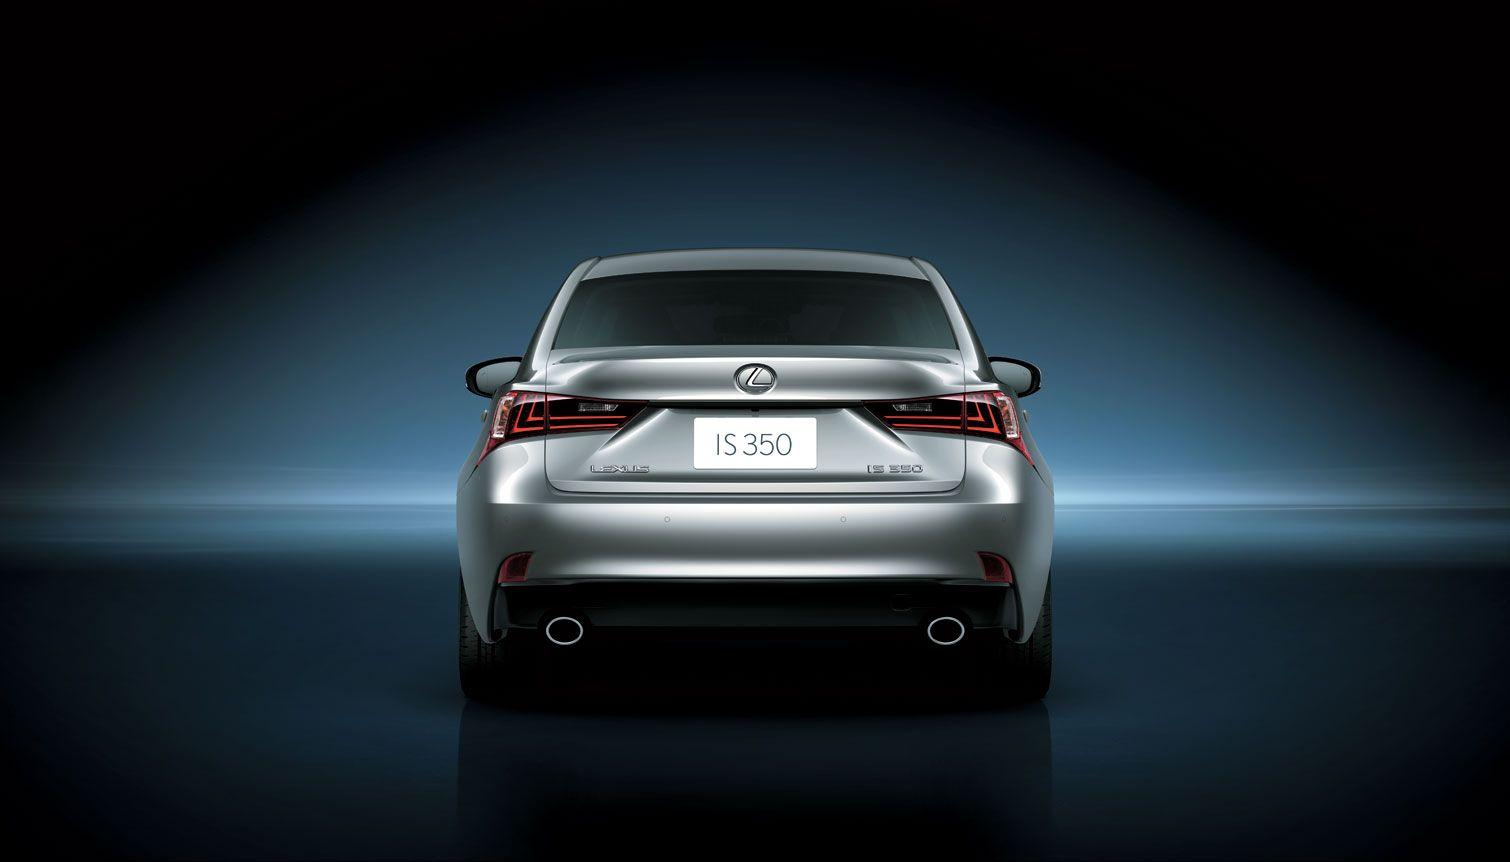 Lexus IS 350 Sports Luxury Lexus IS New lexus